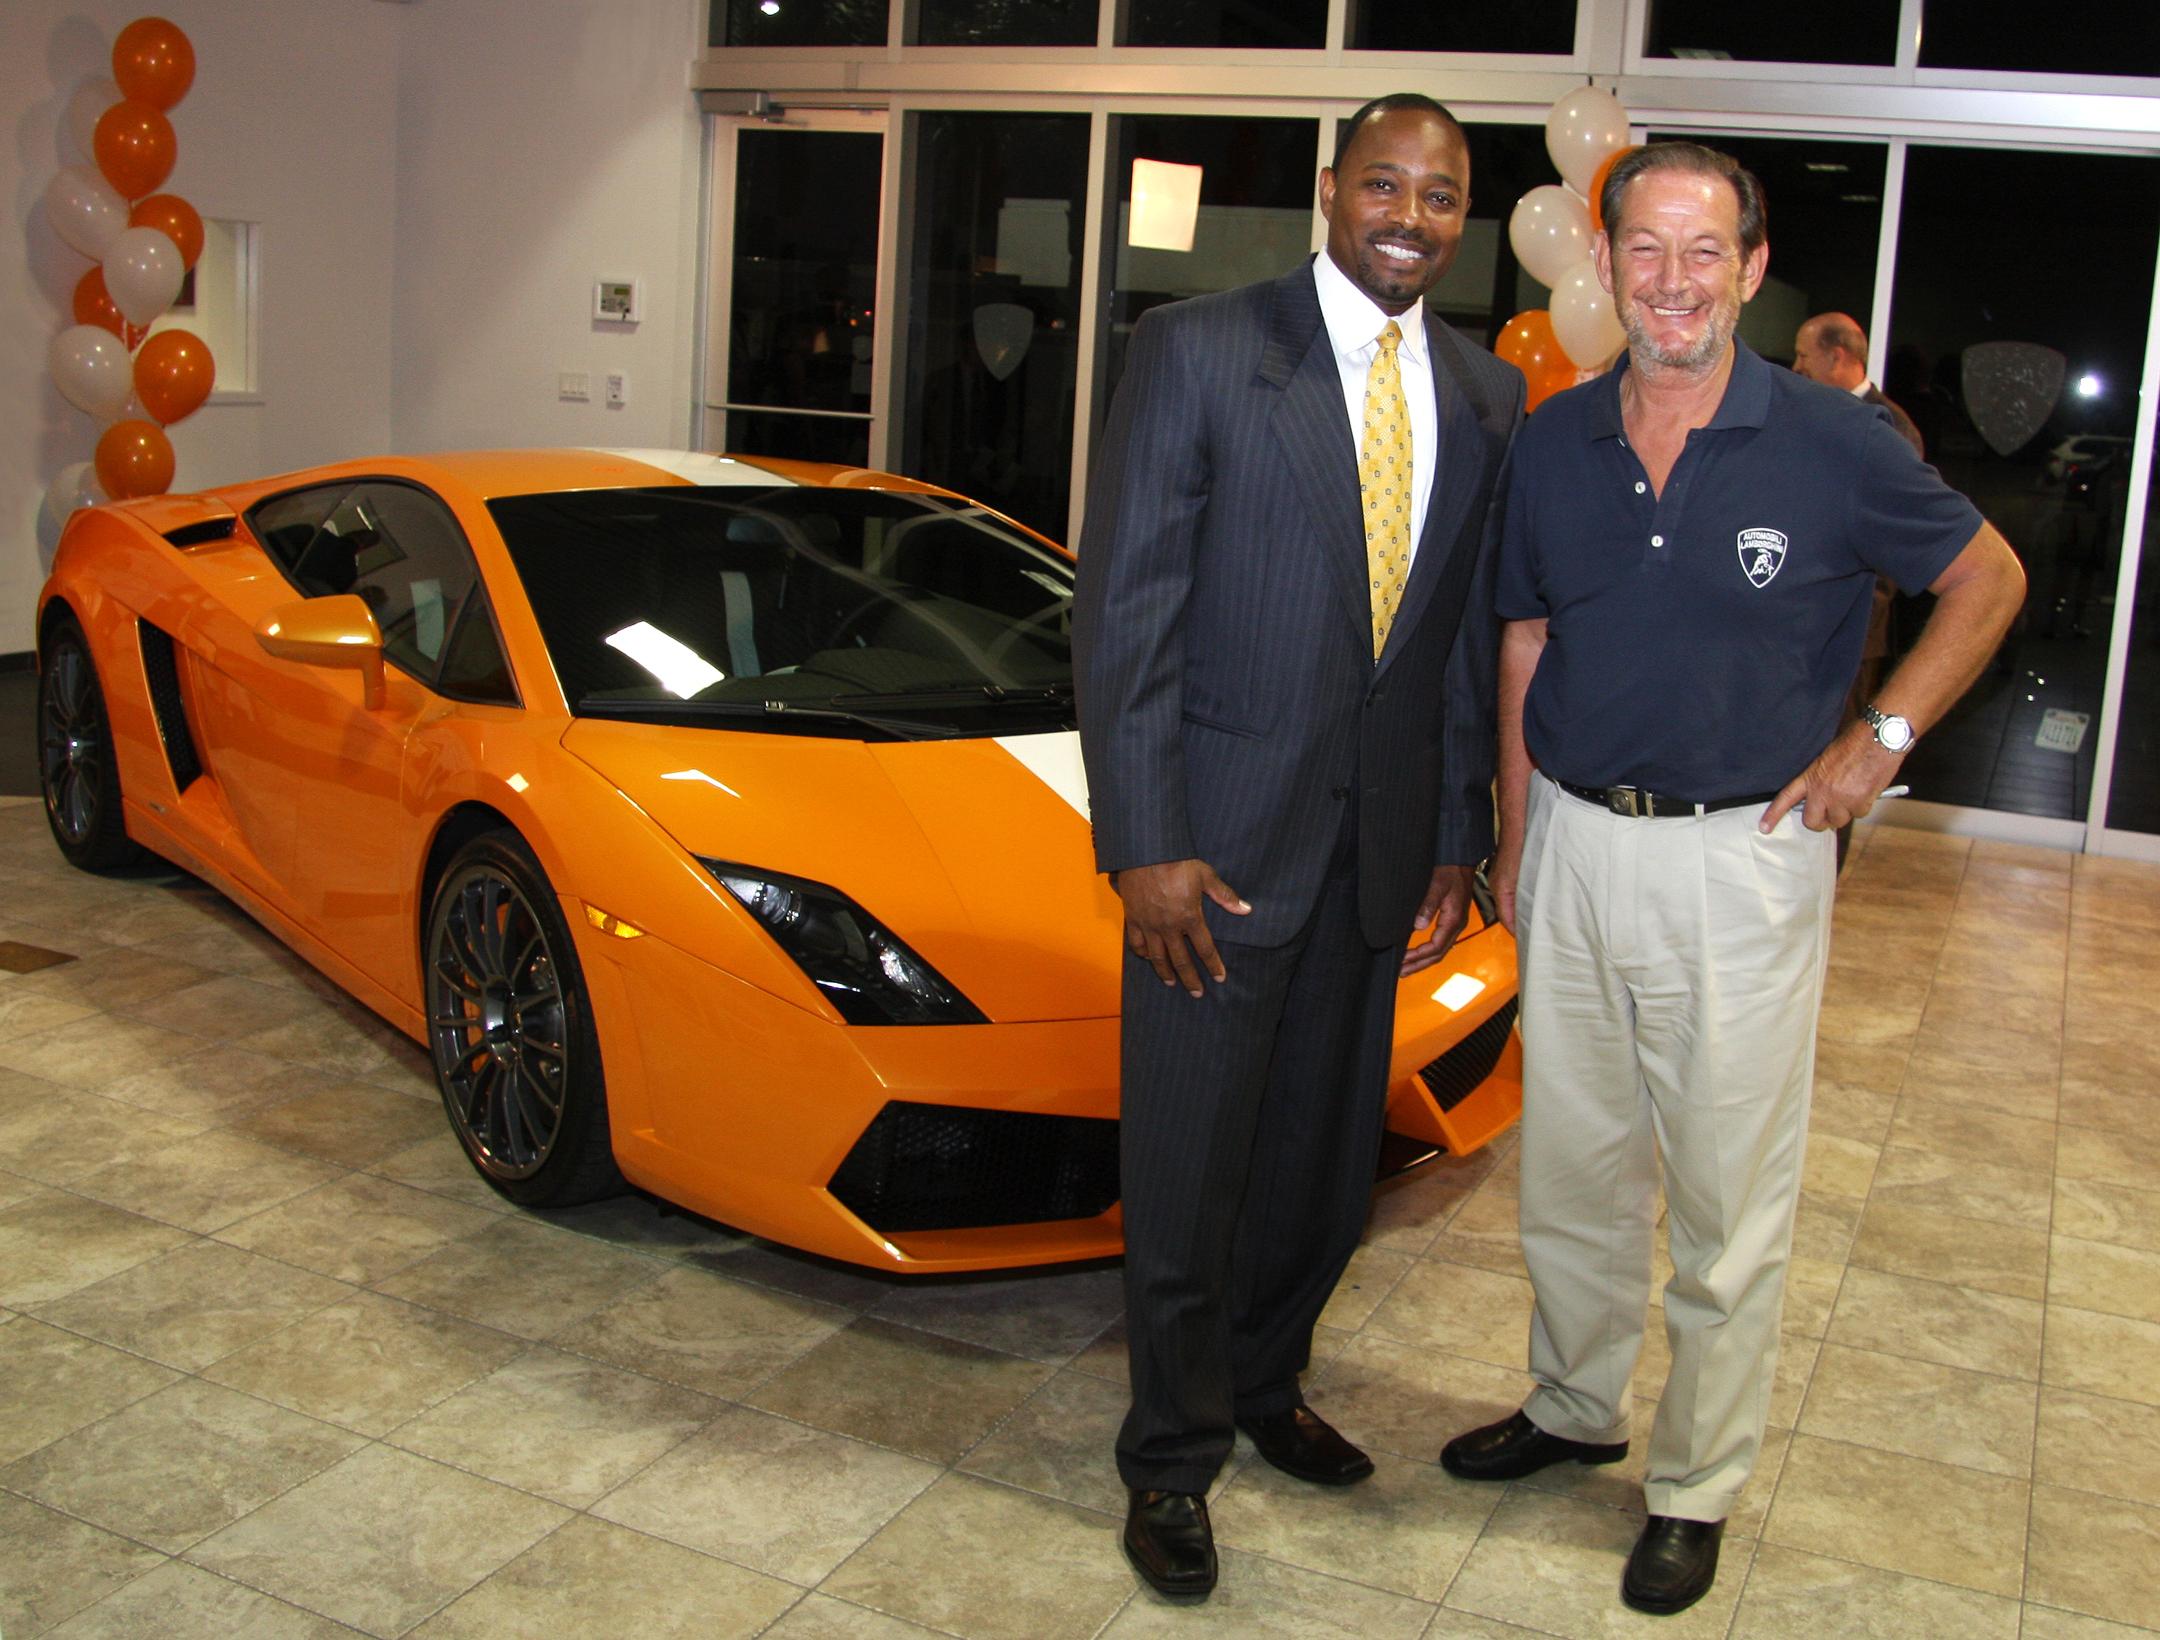 Nice Victor Young (Lamborghini Sarasota) And Valentino BalboniVictor Young  (President Of Lamborghini Sarasota) And Valentino Balboni (Lamborghini)  Standing In ...